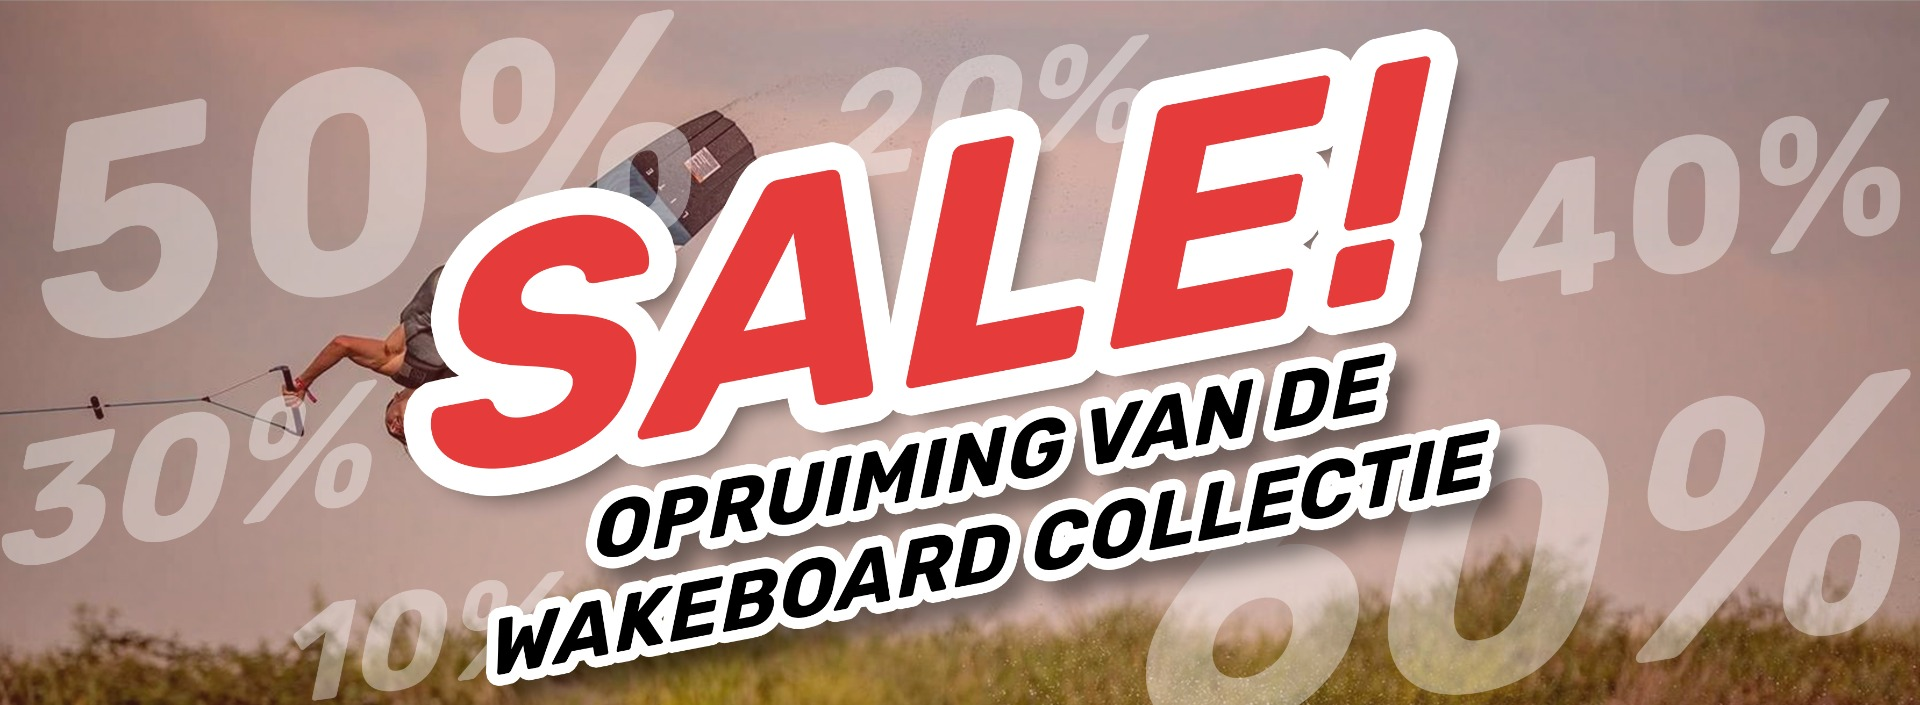 Wakeboard Sale